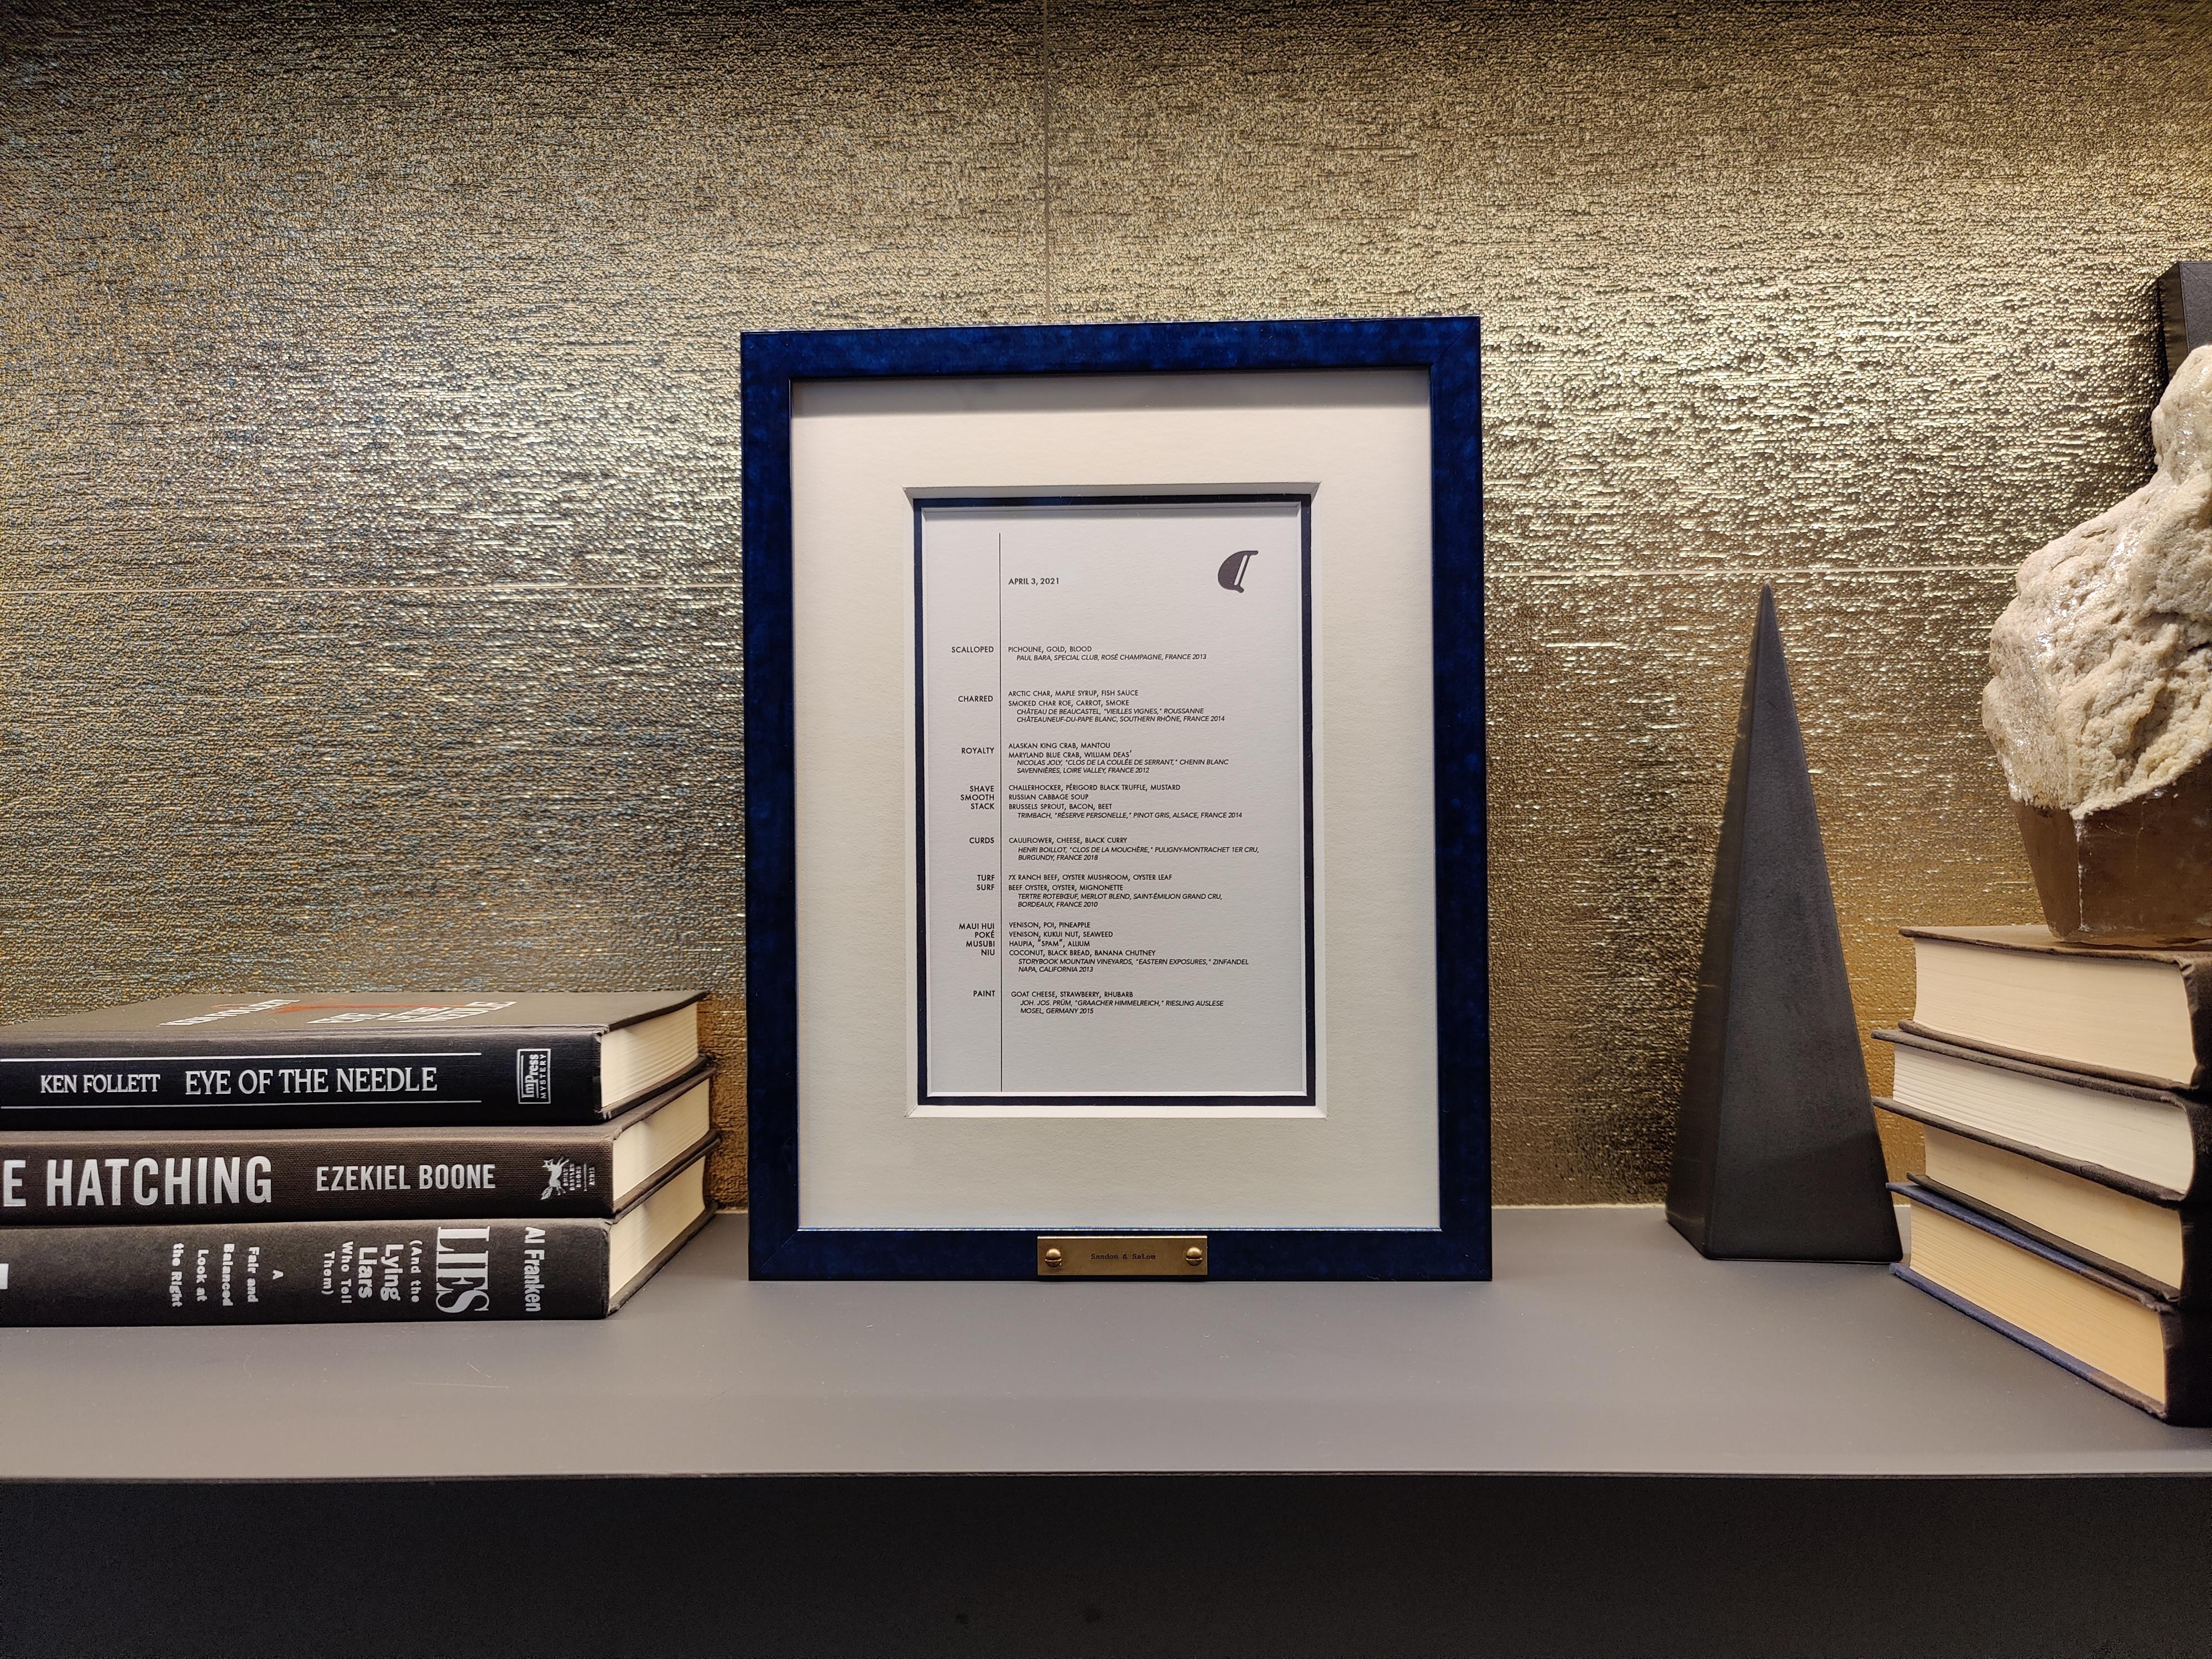 alinea menu in blue frame on bookcase